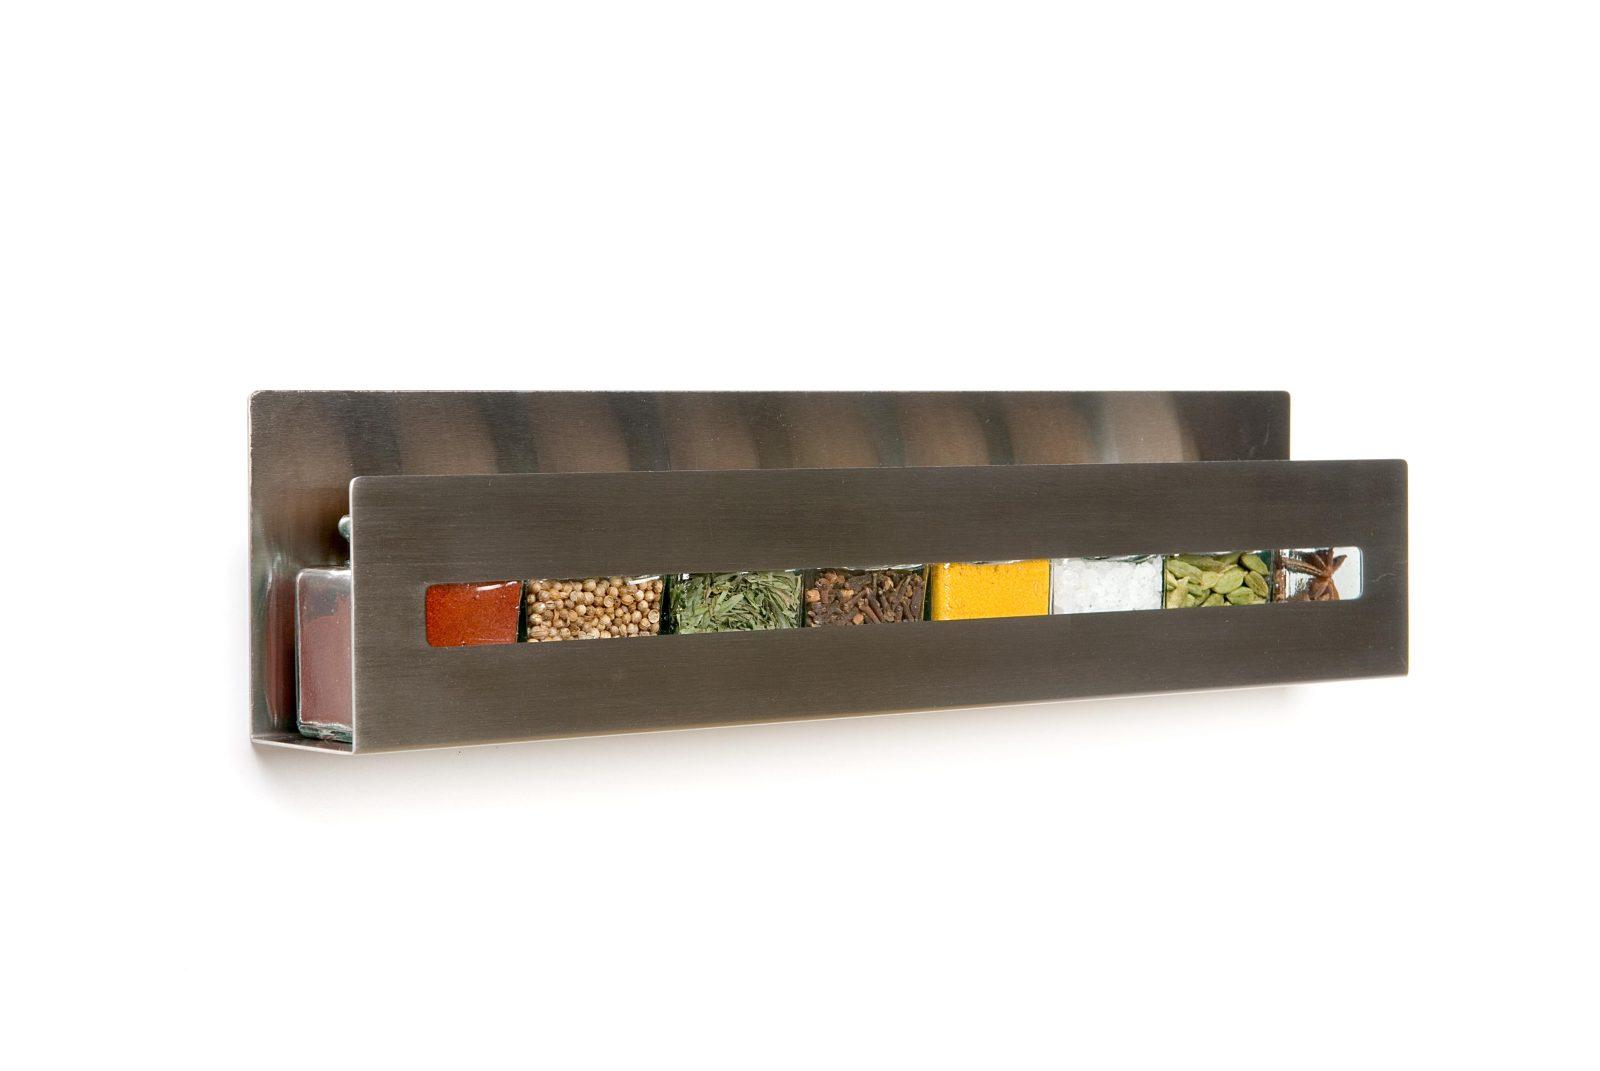 Aperture Spice Rack by Desu Design-22589